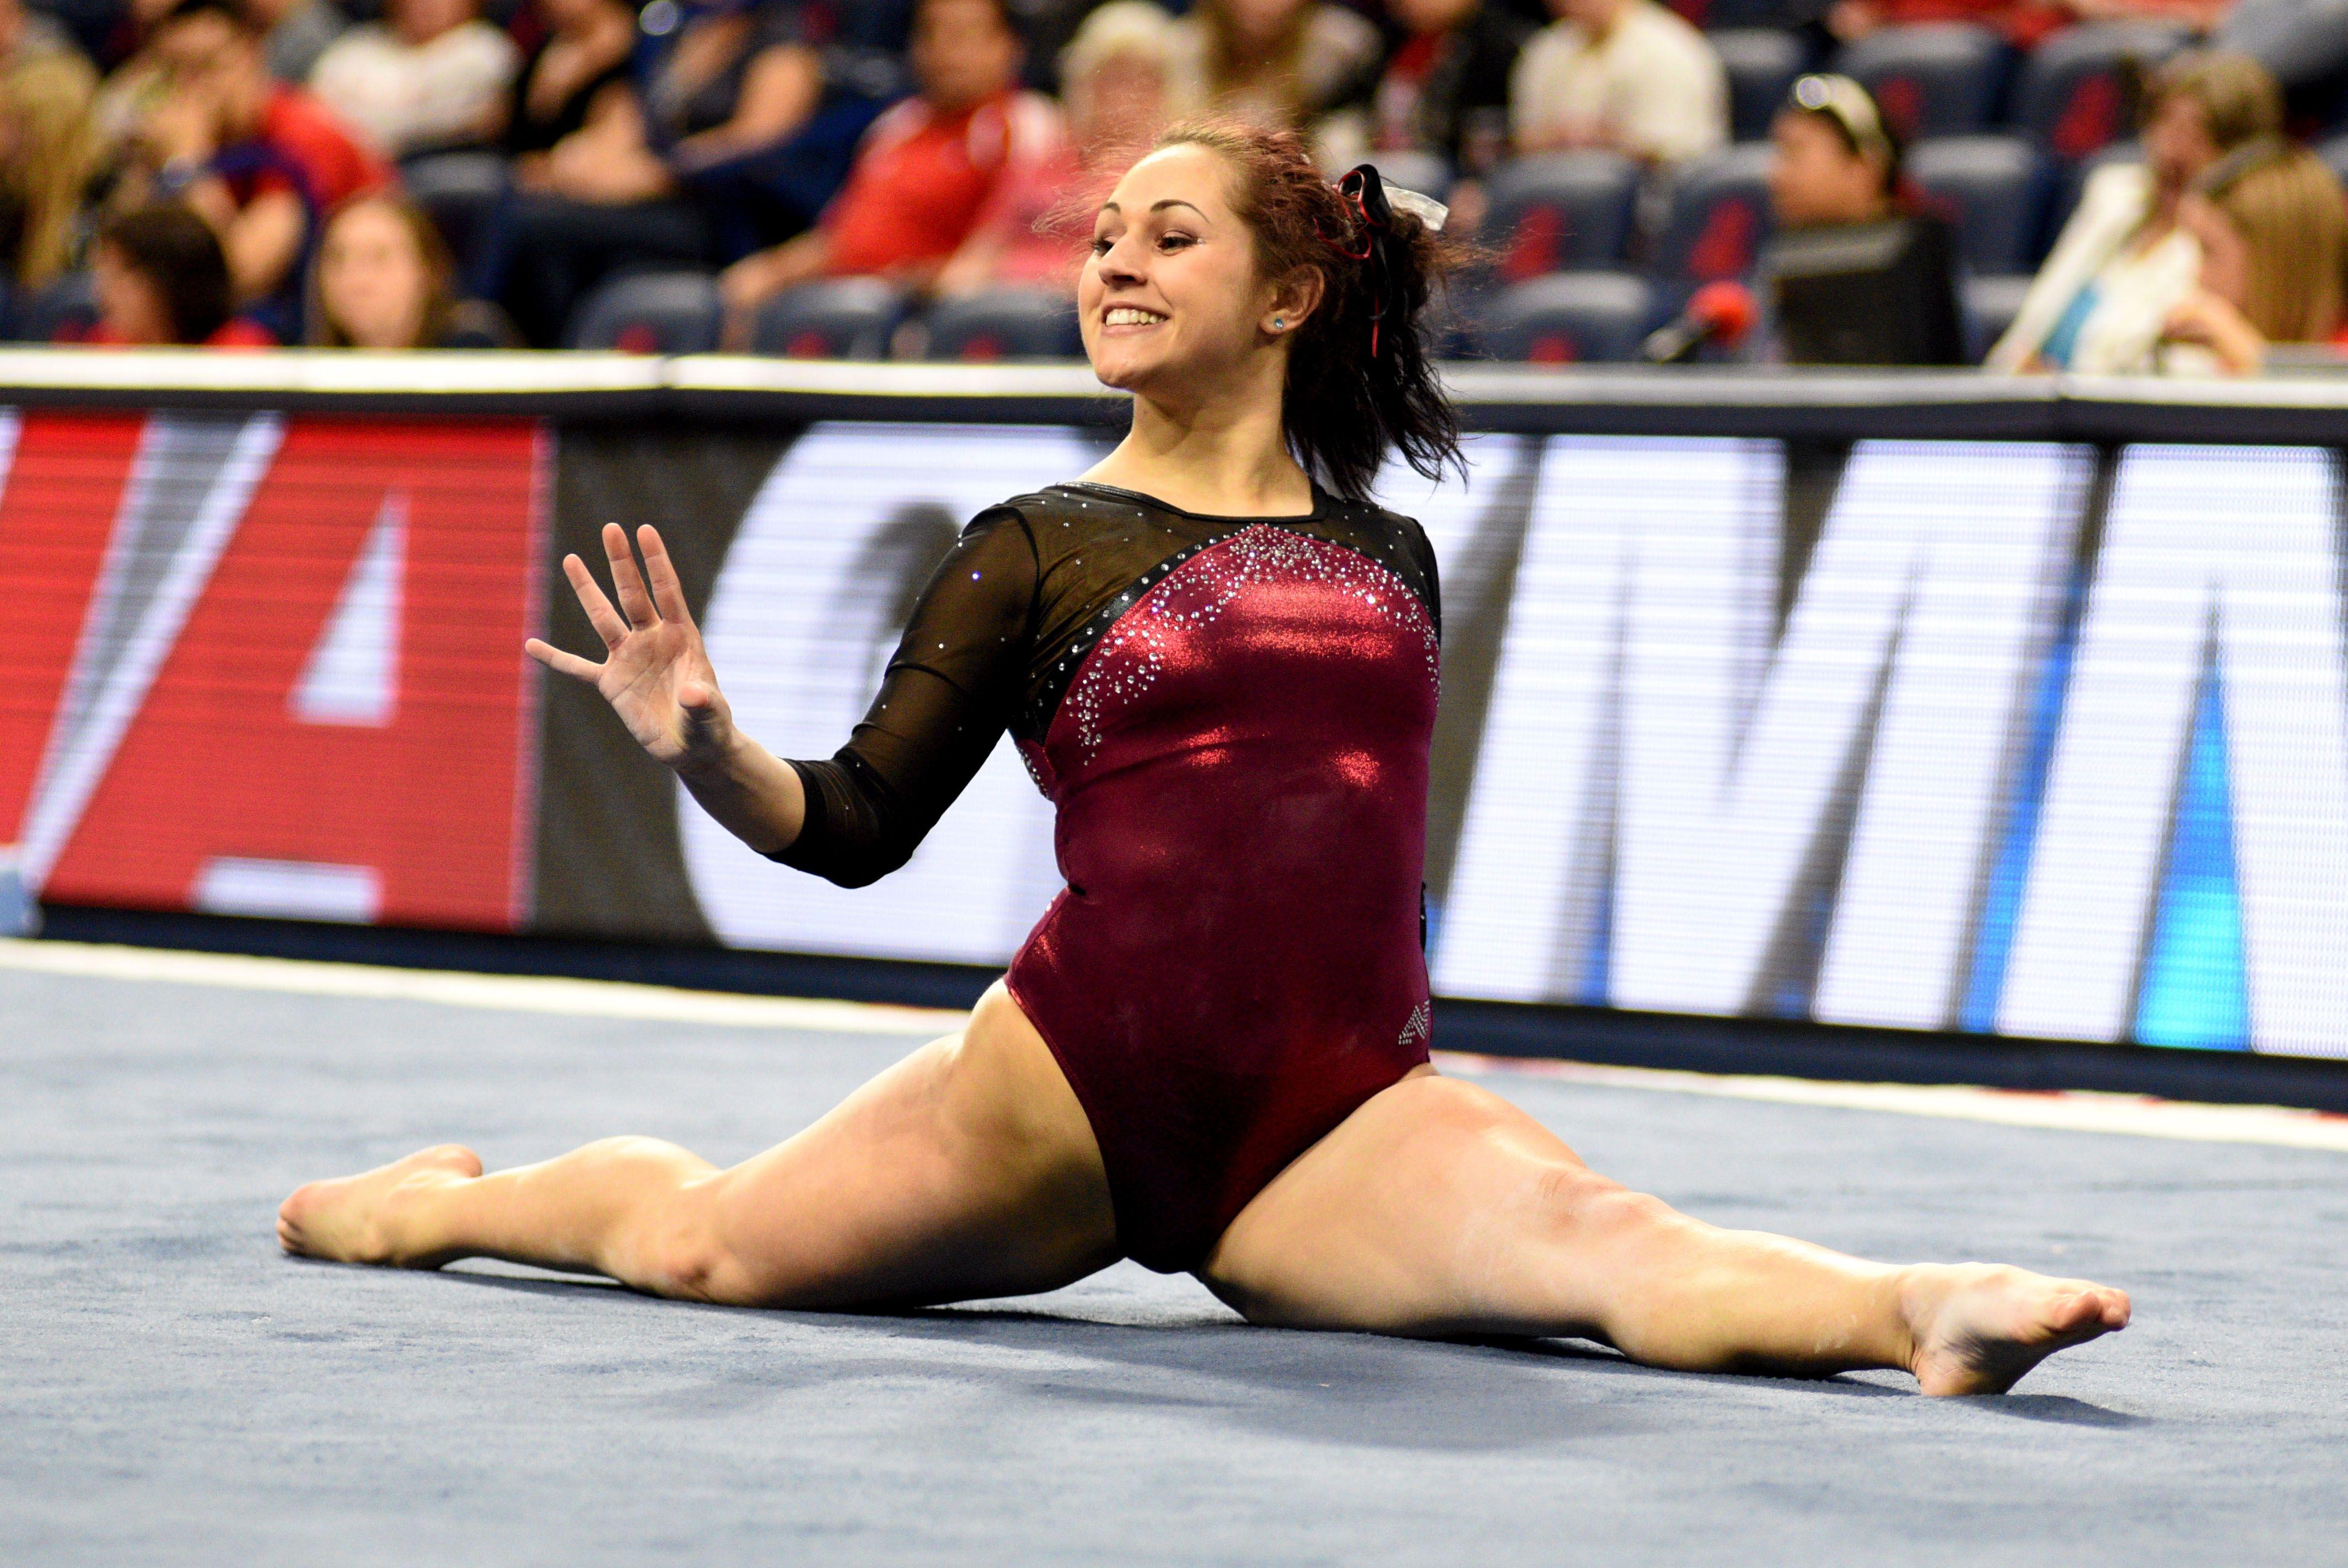 floor gymnastics splits. gymnastics floor splits